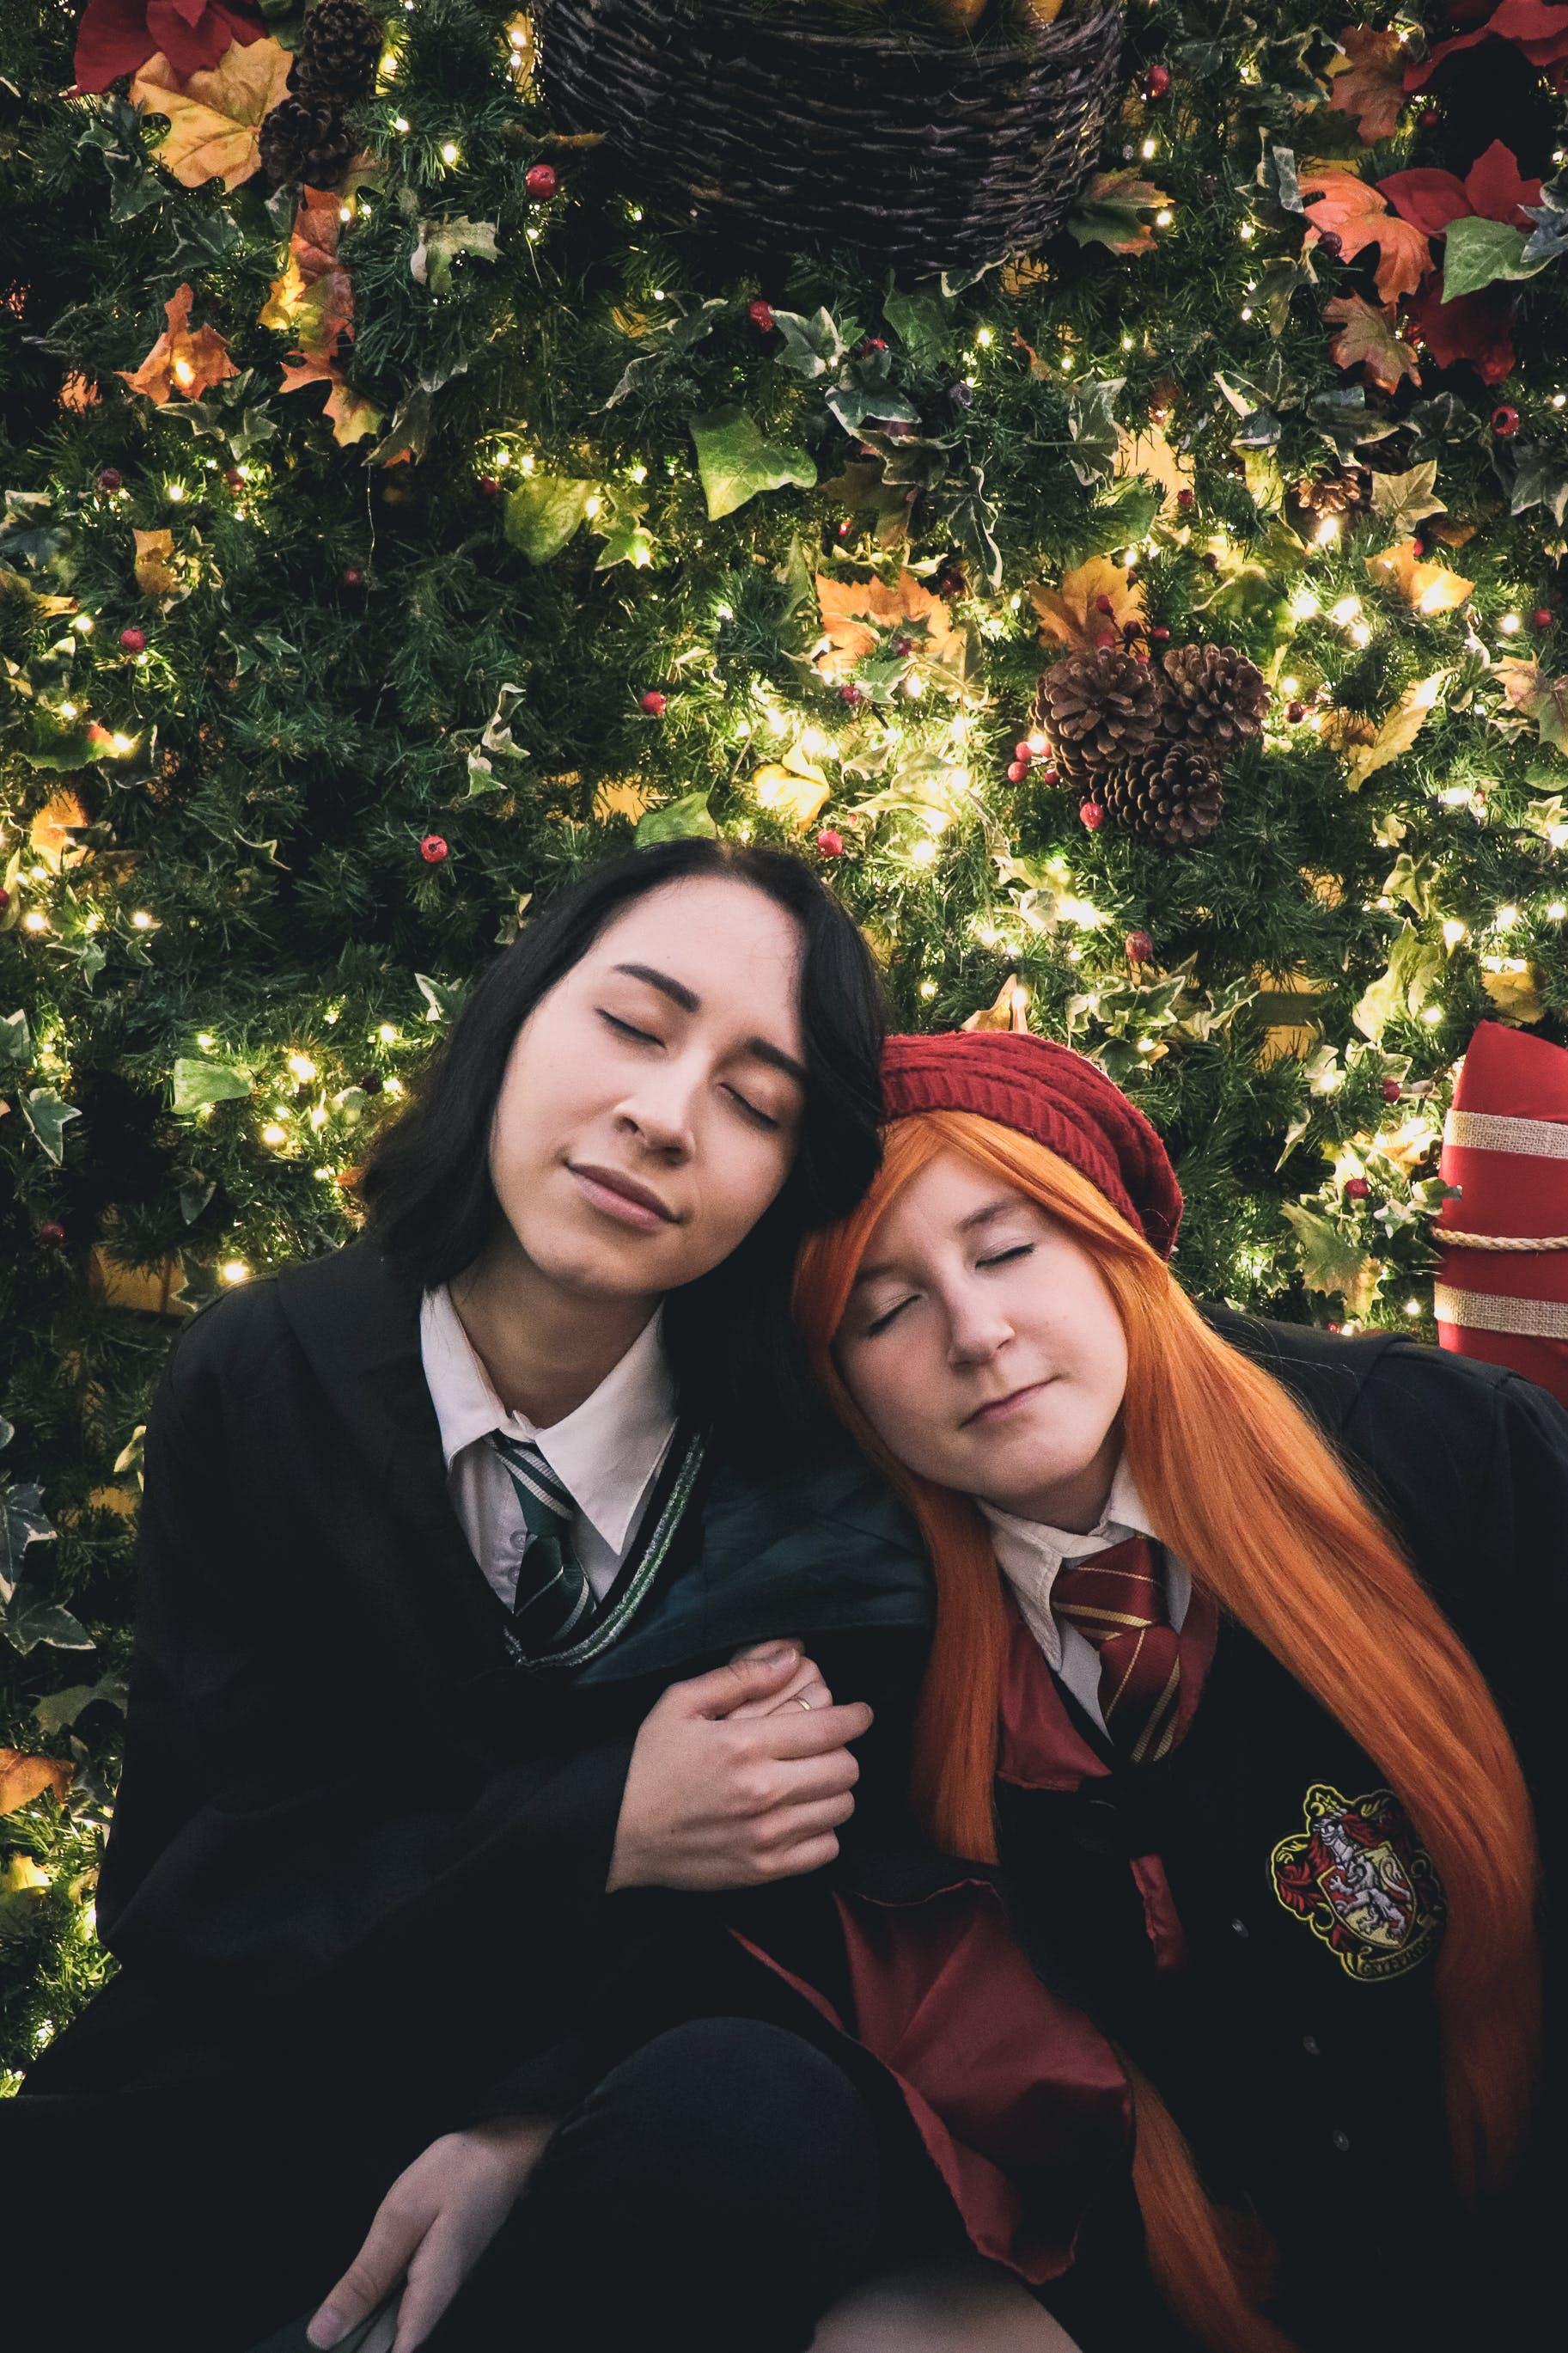 Free stock photo of beautiful girl, blurred background, bonnet, christmas lights